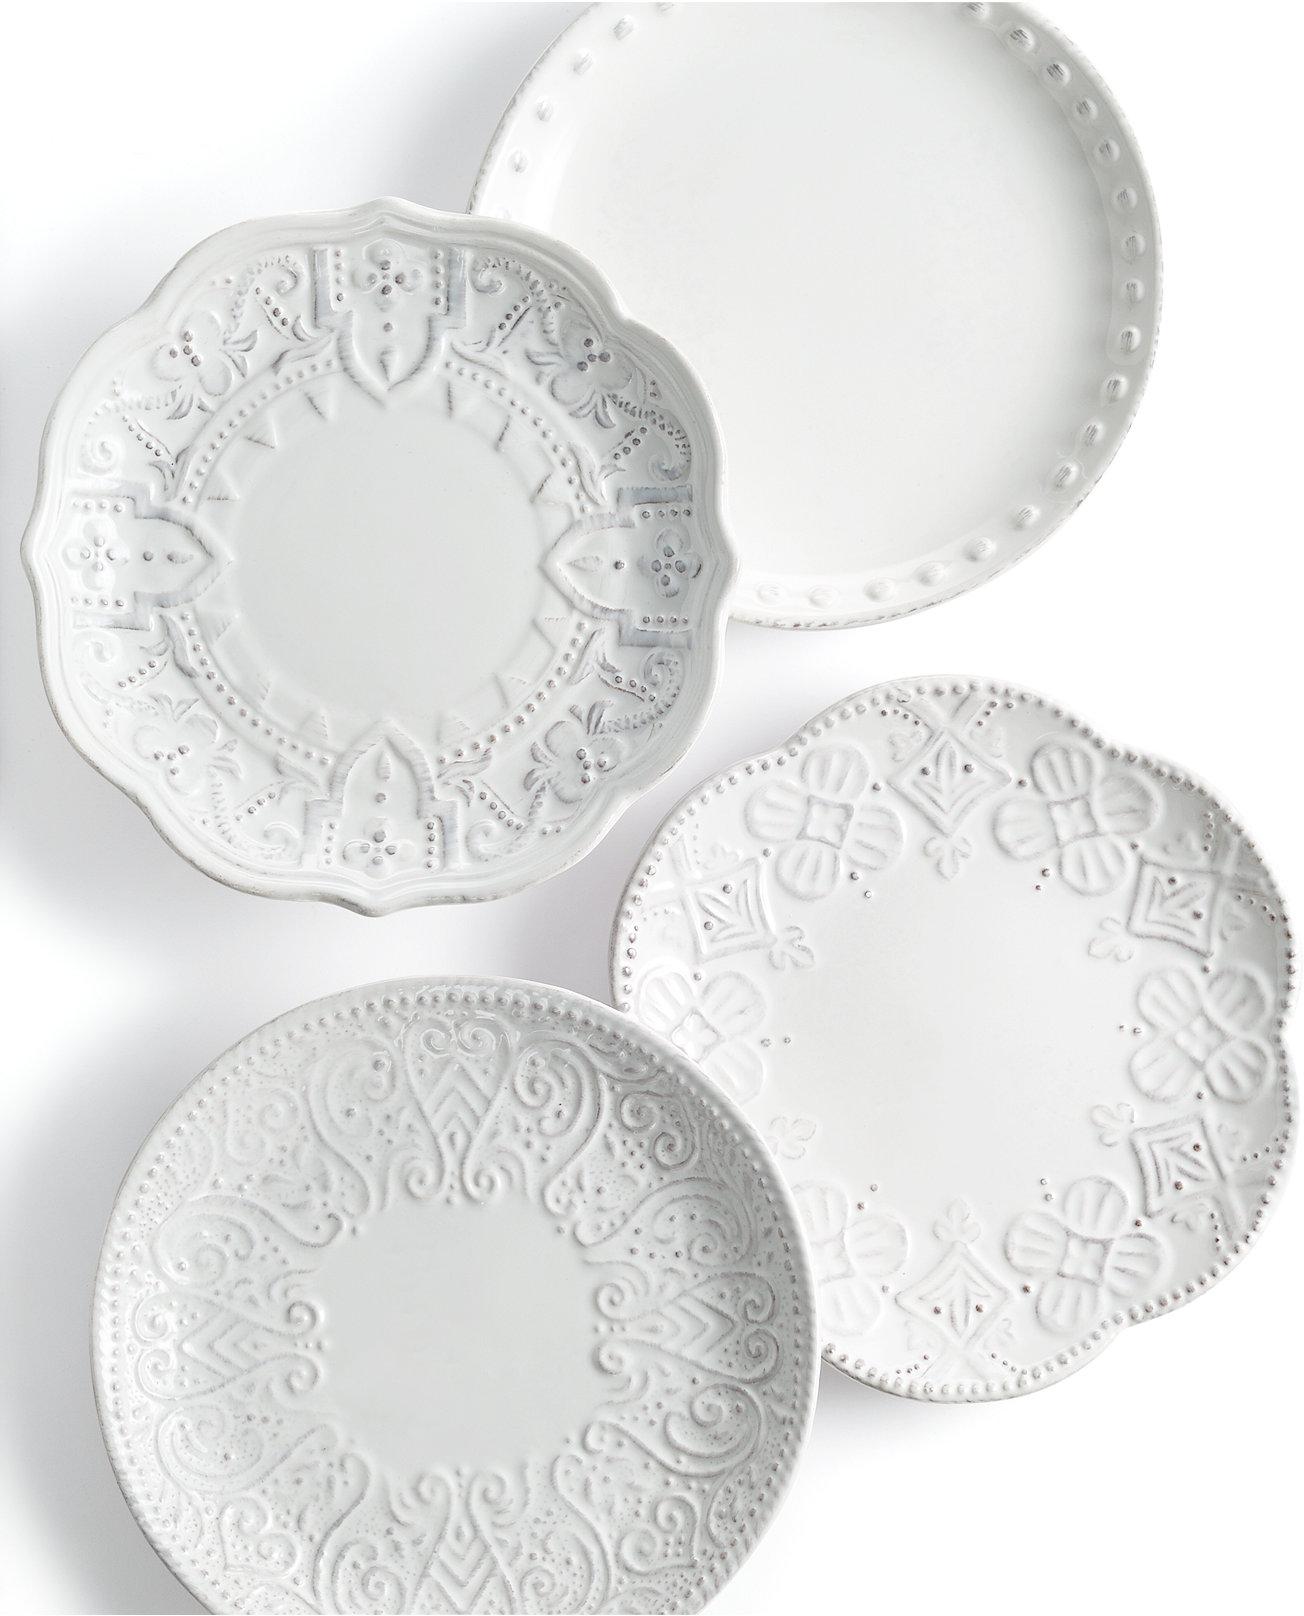 White apron macy's - Maison Versailles Blanc Set Of 4 Assorted Appetizer Plates Dinnerware Dining Entertaining